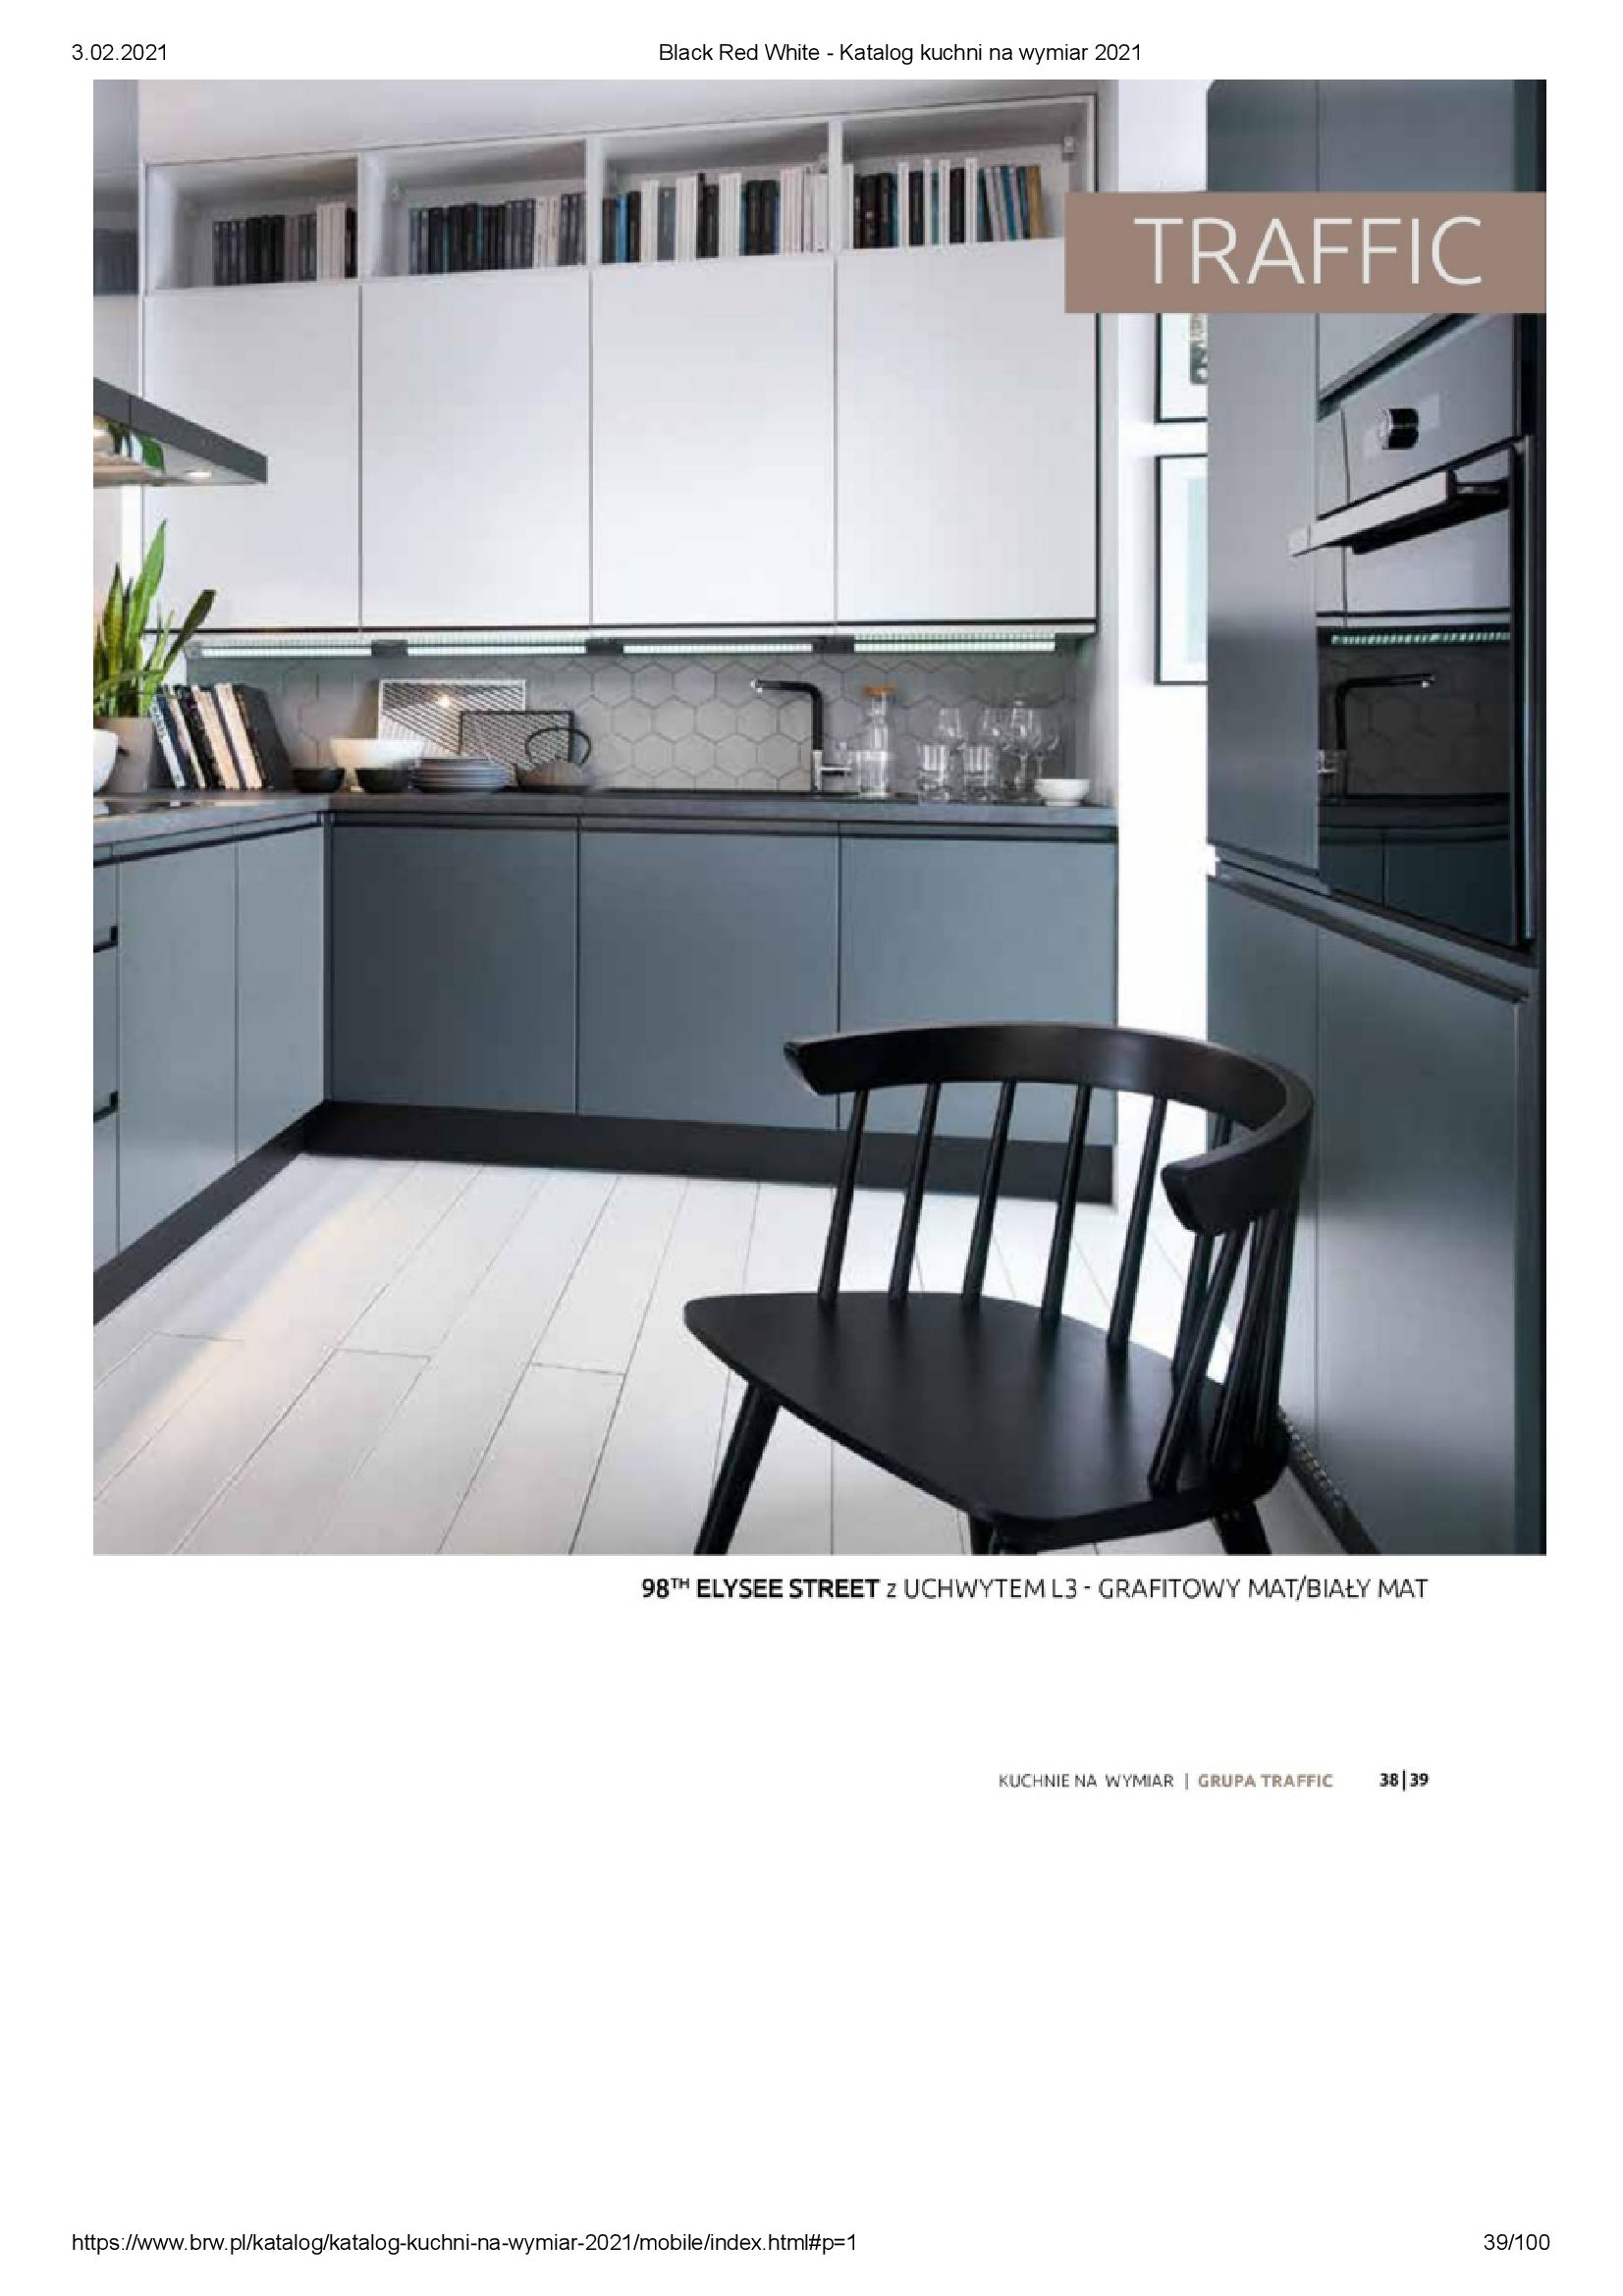 Gazetka Black Red White: Katalog - Kuchnie na wymiar Senso Kitchens 2021 2021-01-01 page-39